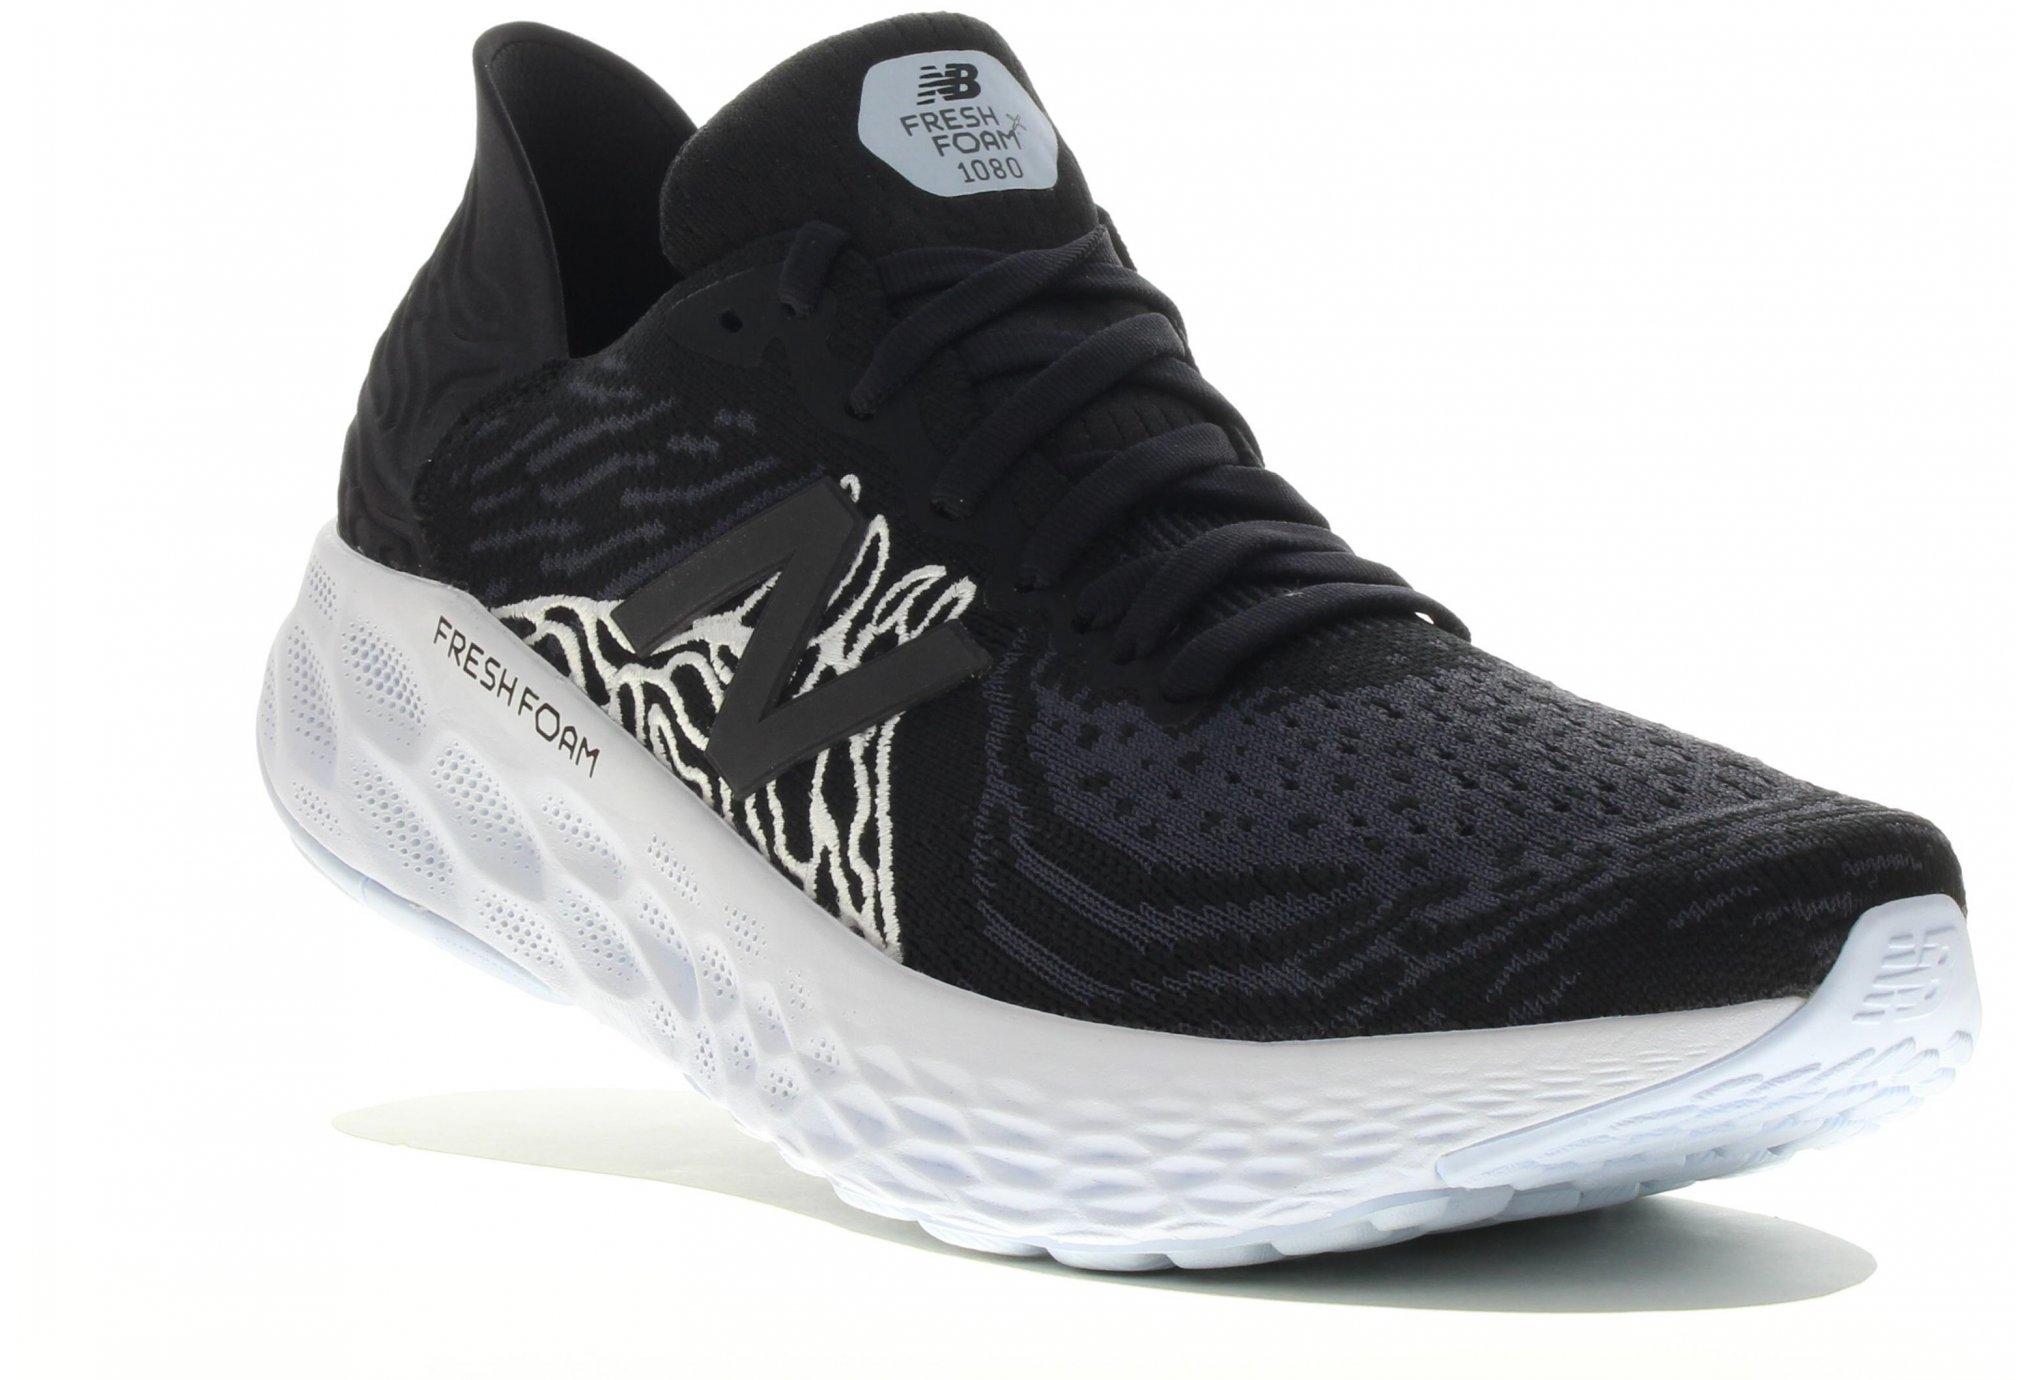 New Balance Fresh Foam W 1080 V10 - B Chaussures running femme